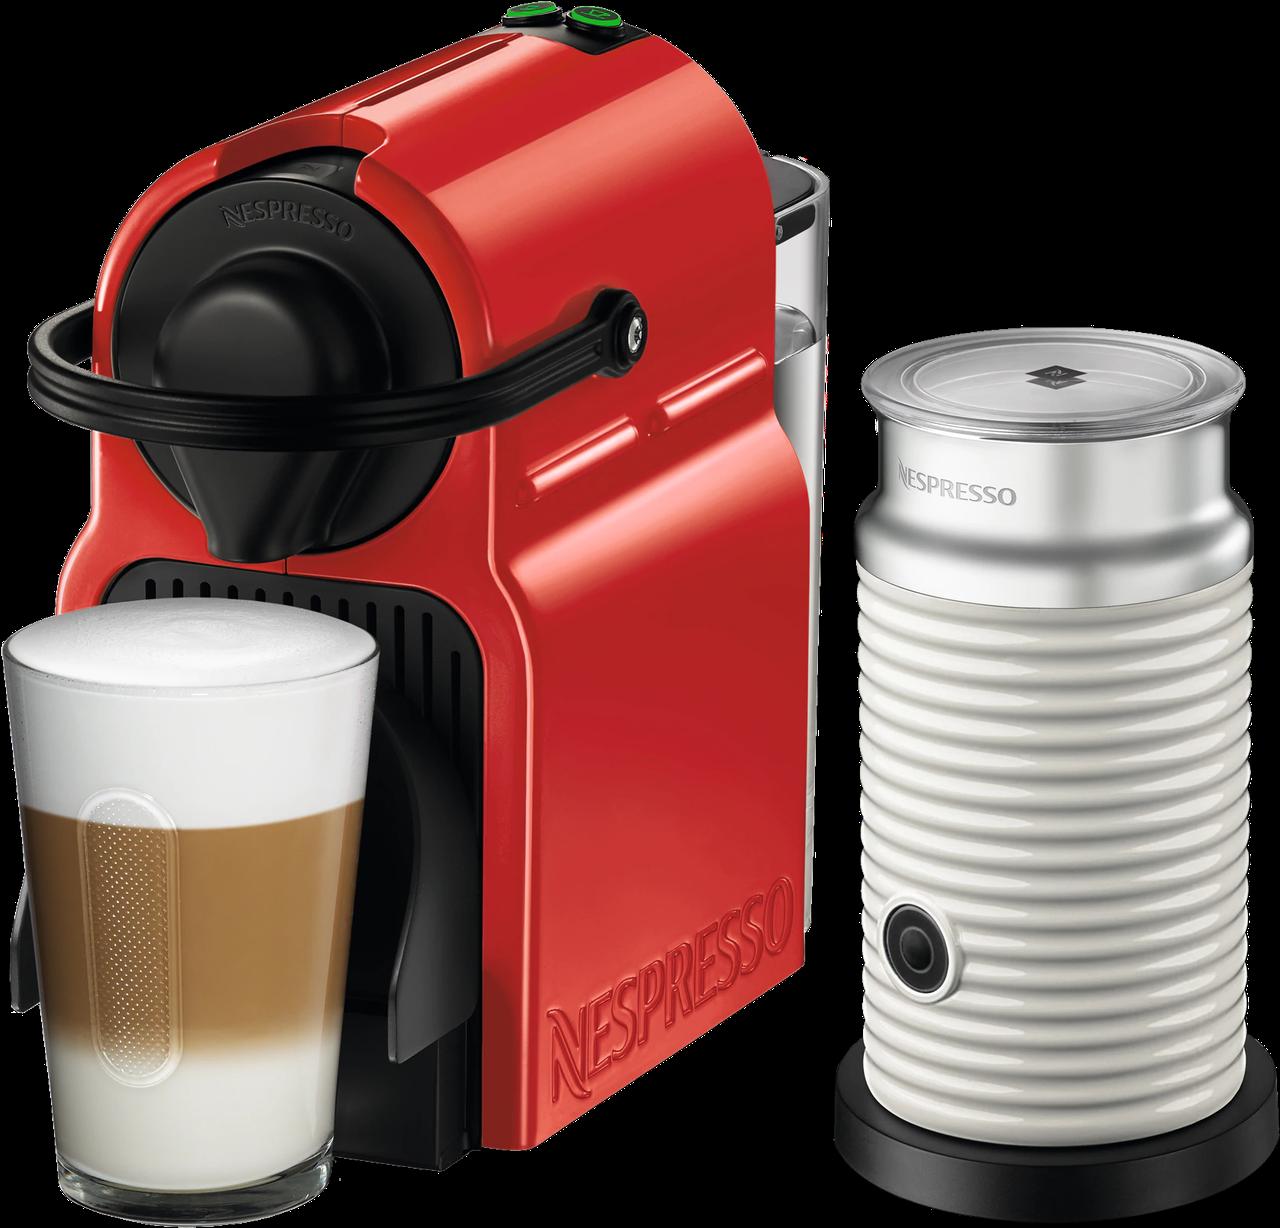 Кофемашина Nespresso Inissia Red D40 & Aeroccino 3 White + доставка бесплат+дегустационный набор (14 капсул)